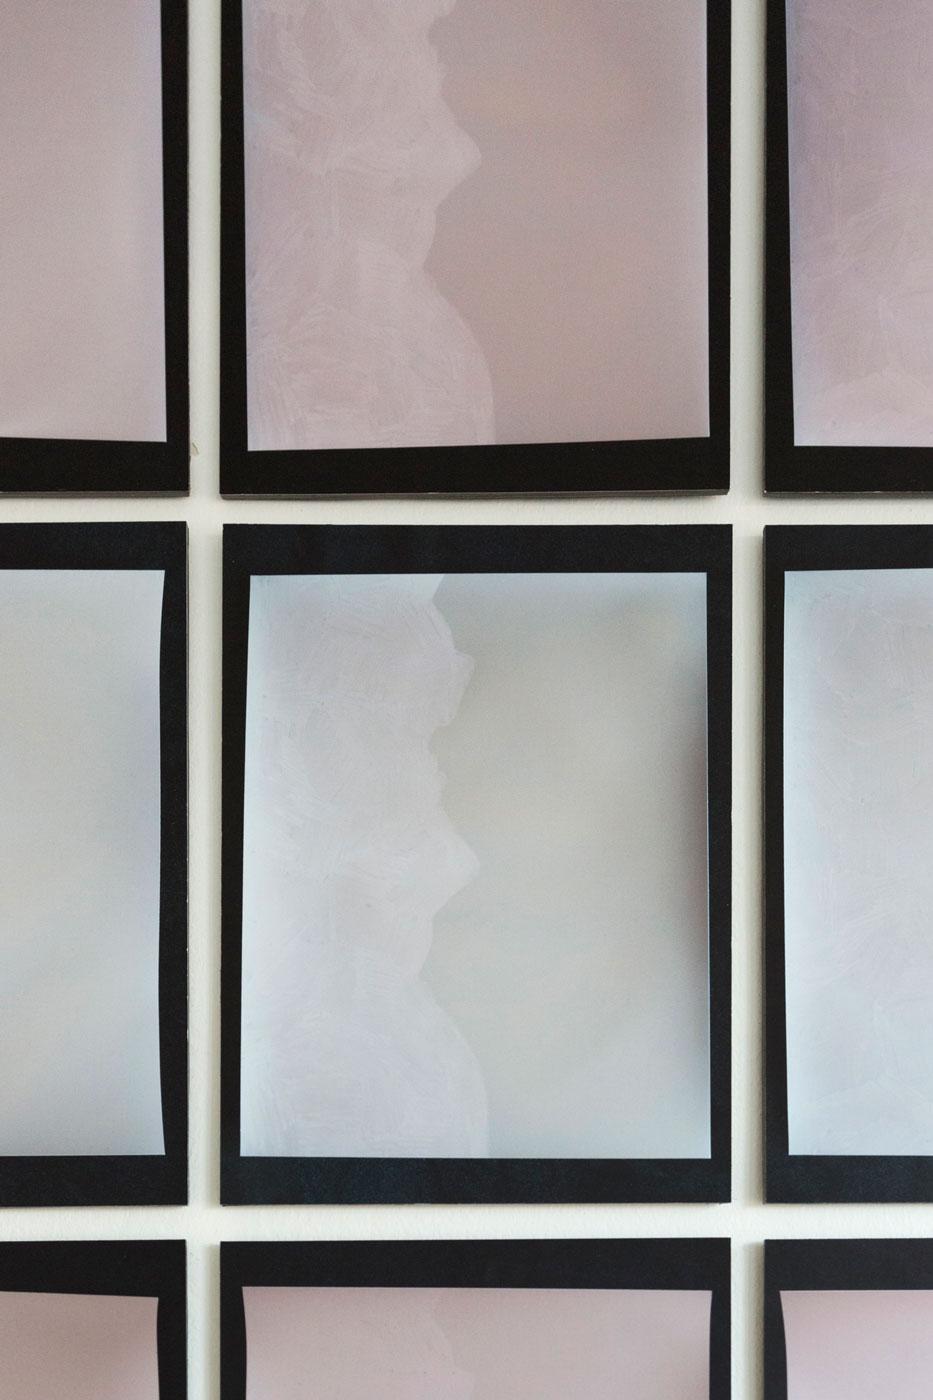 shadow exposures detail